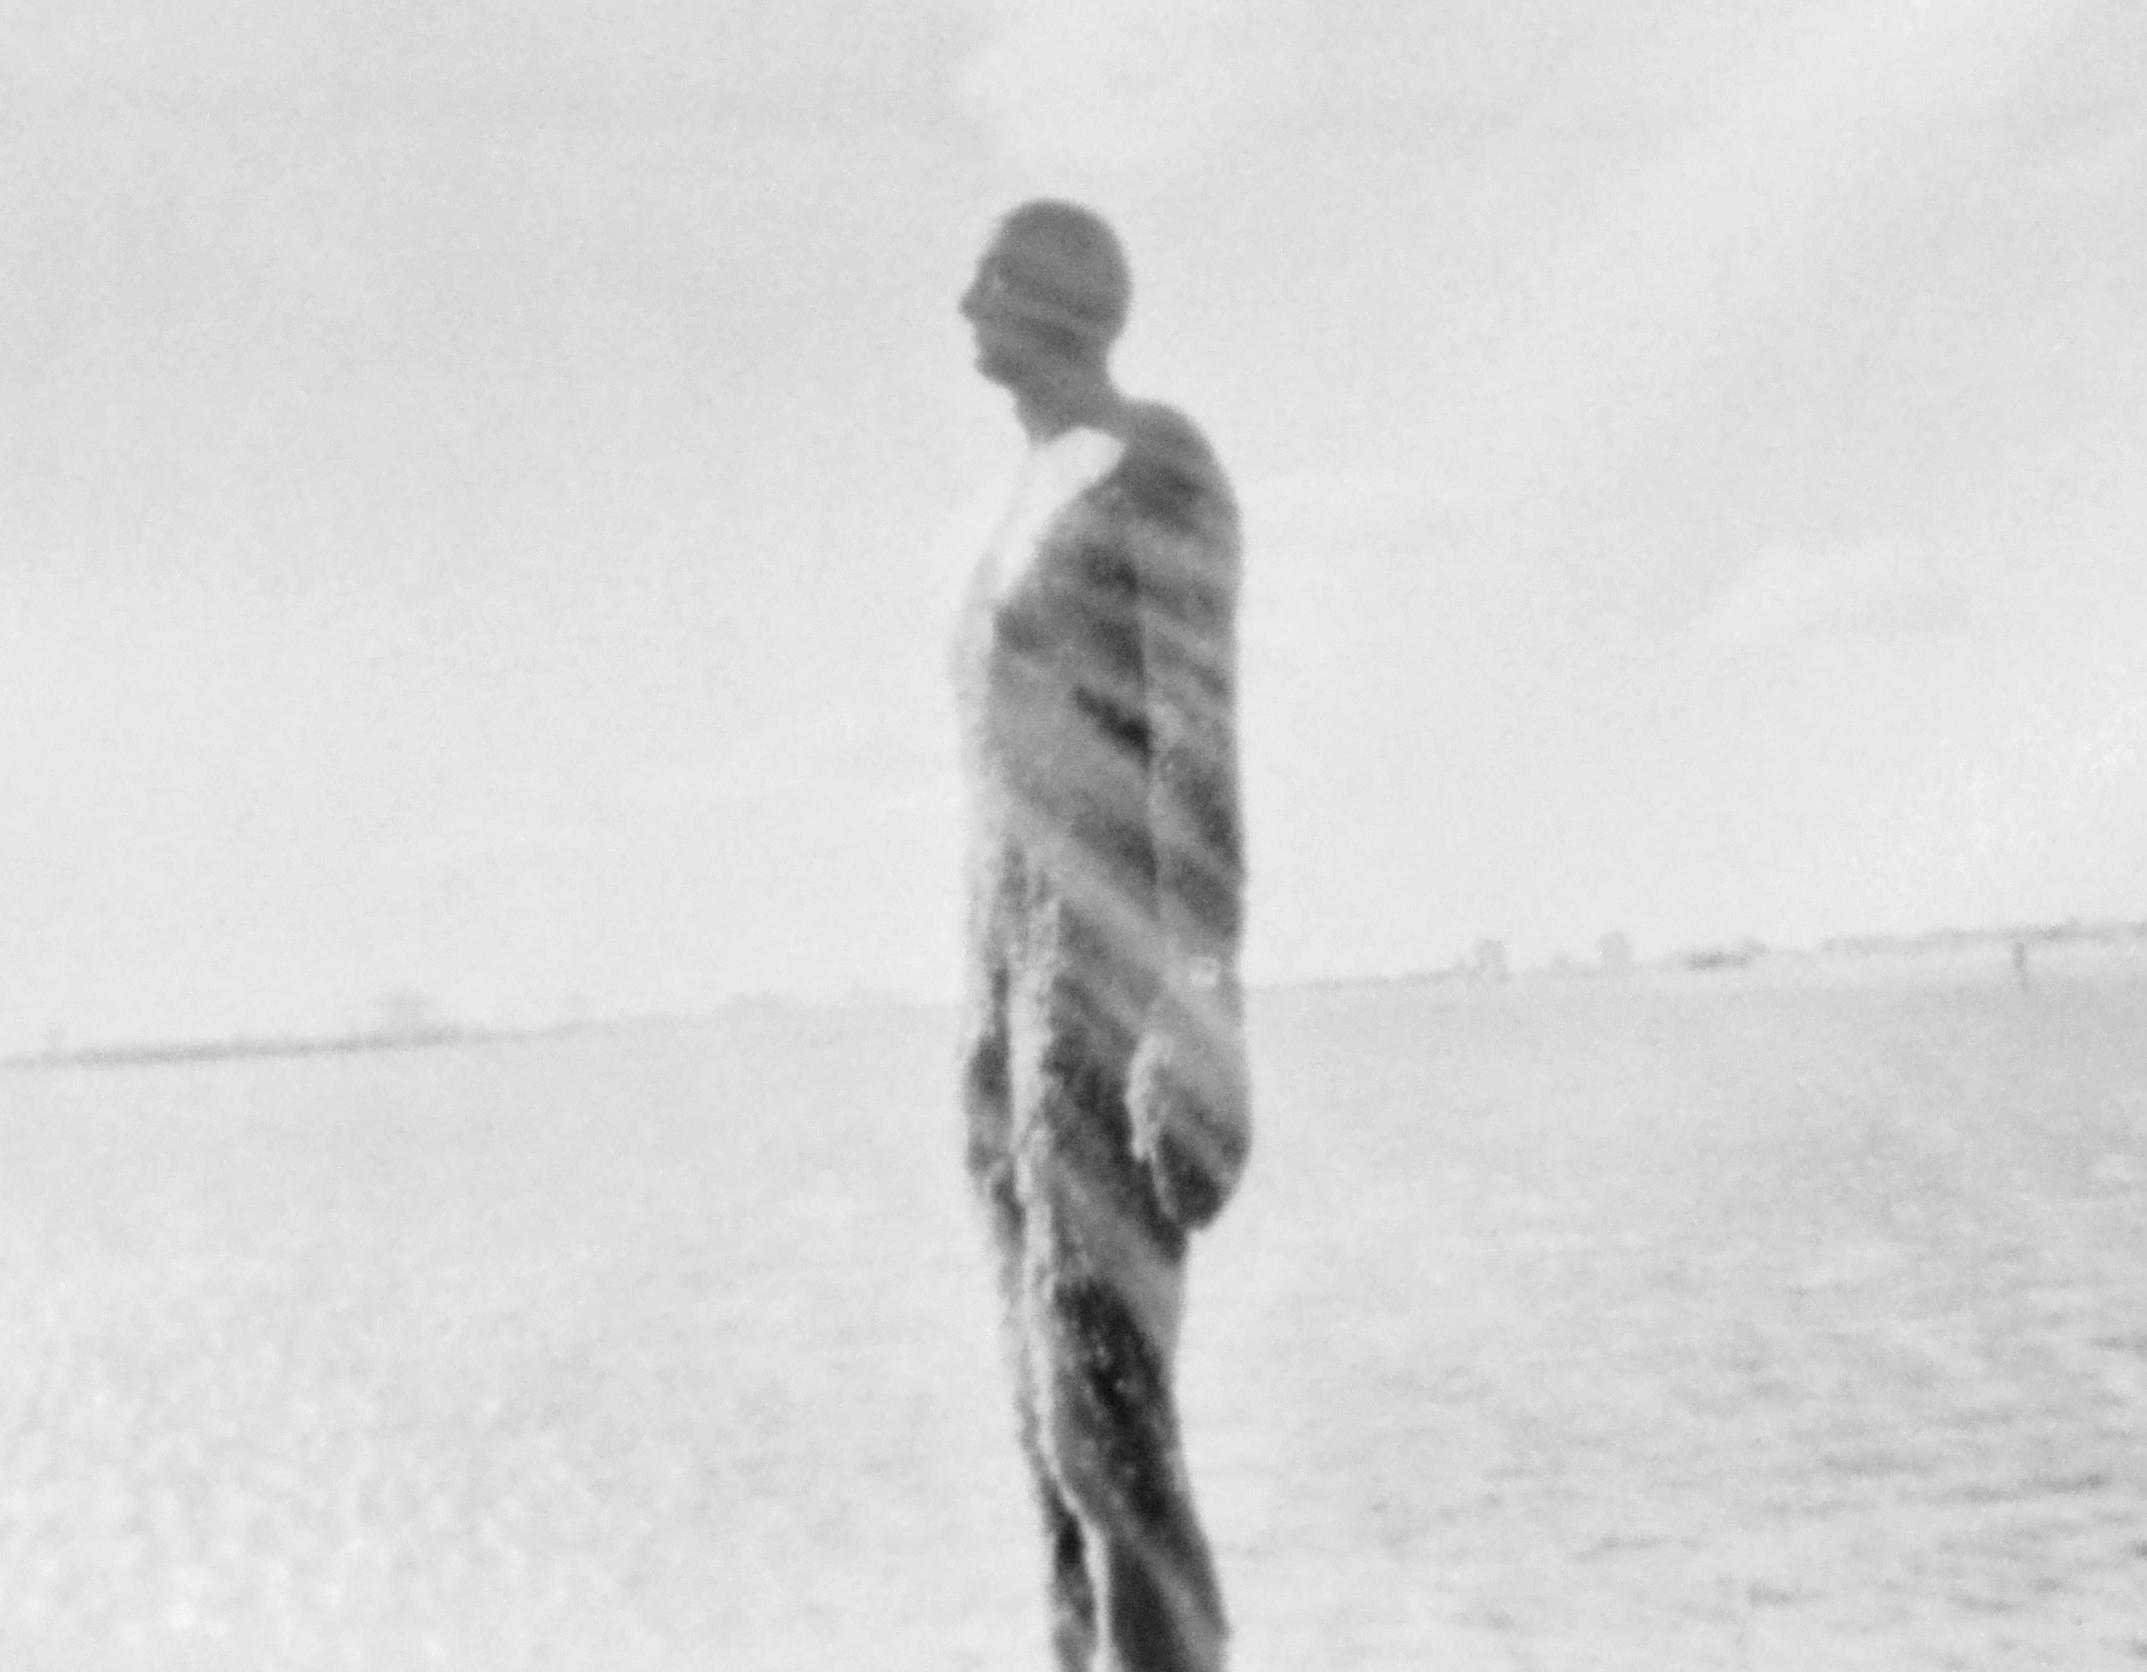 The Man Who Fell To Earth, 5x4 pinhole camera, medical xray film